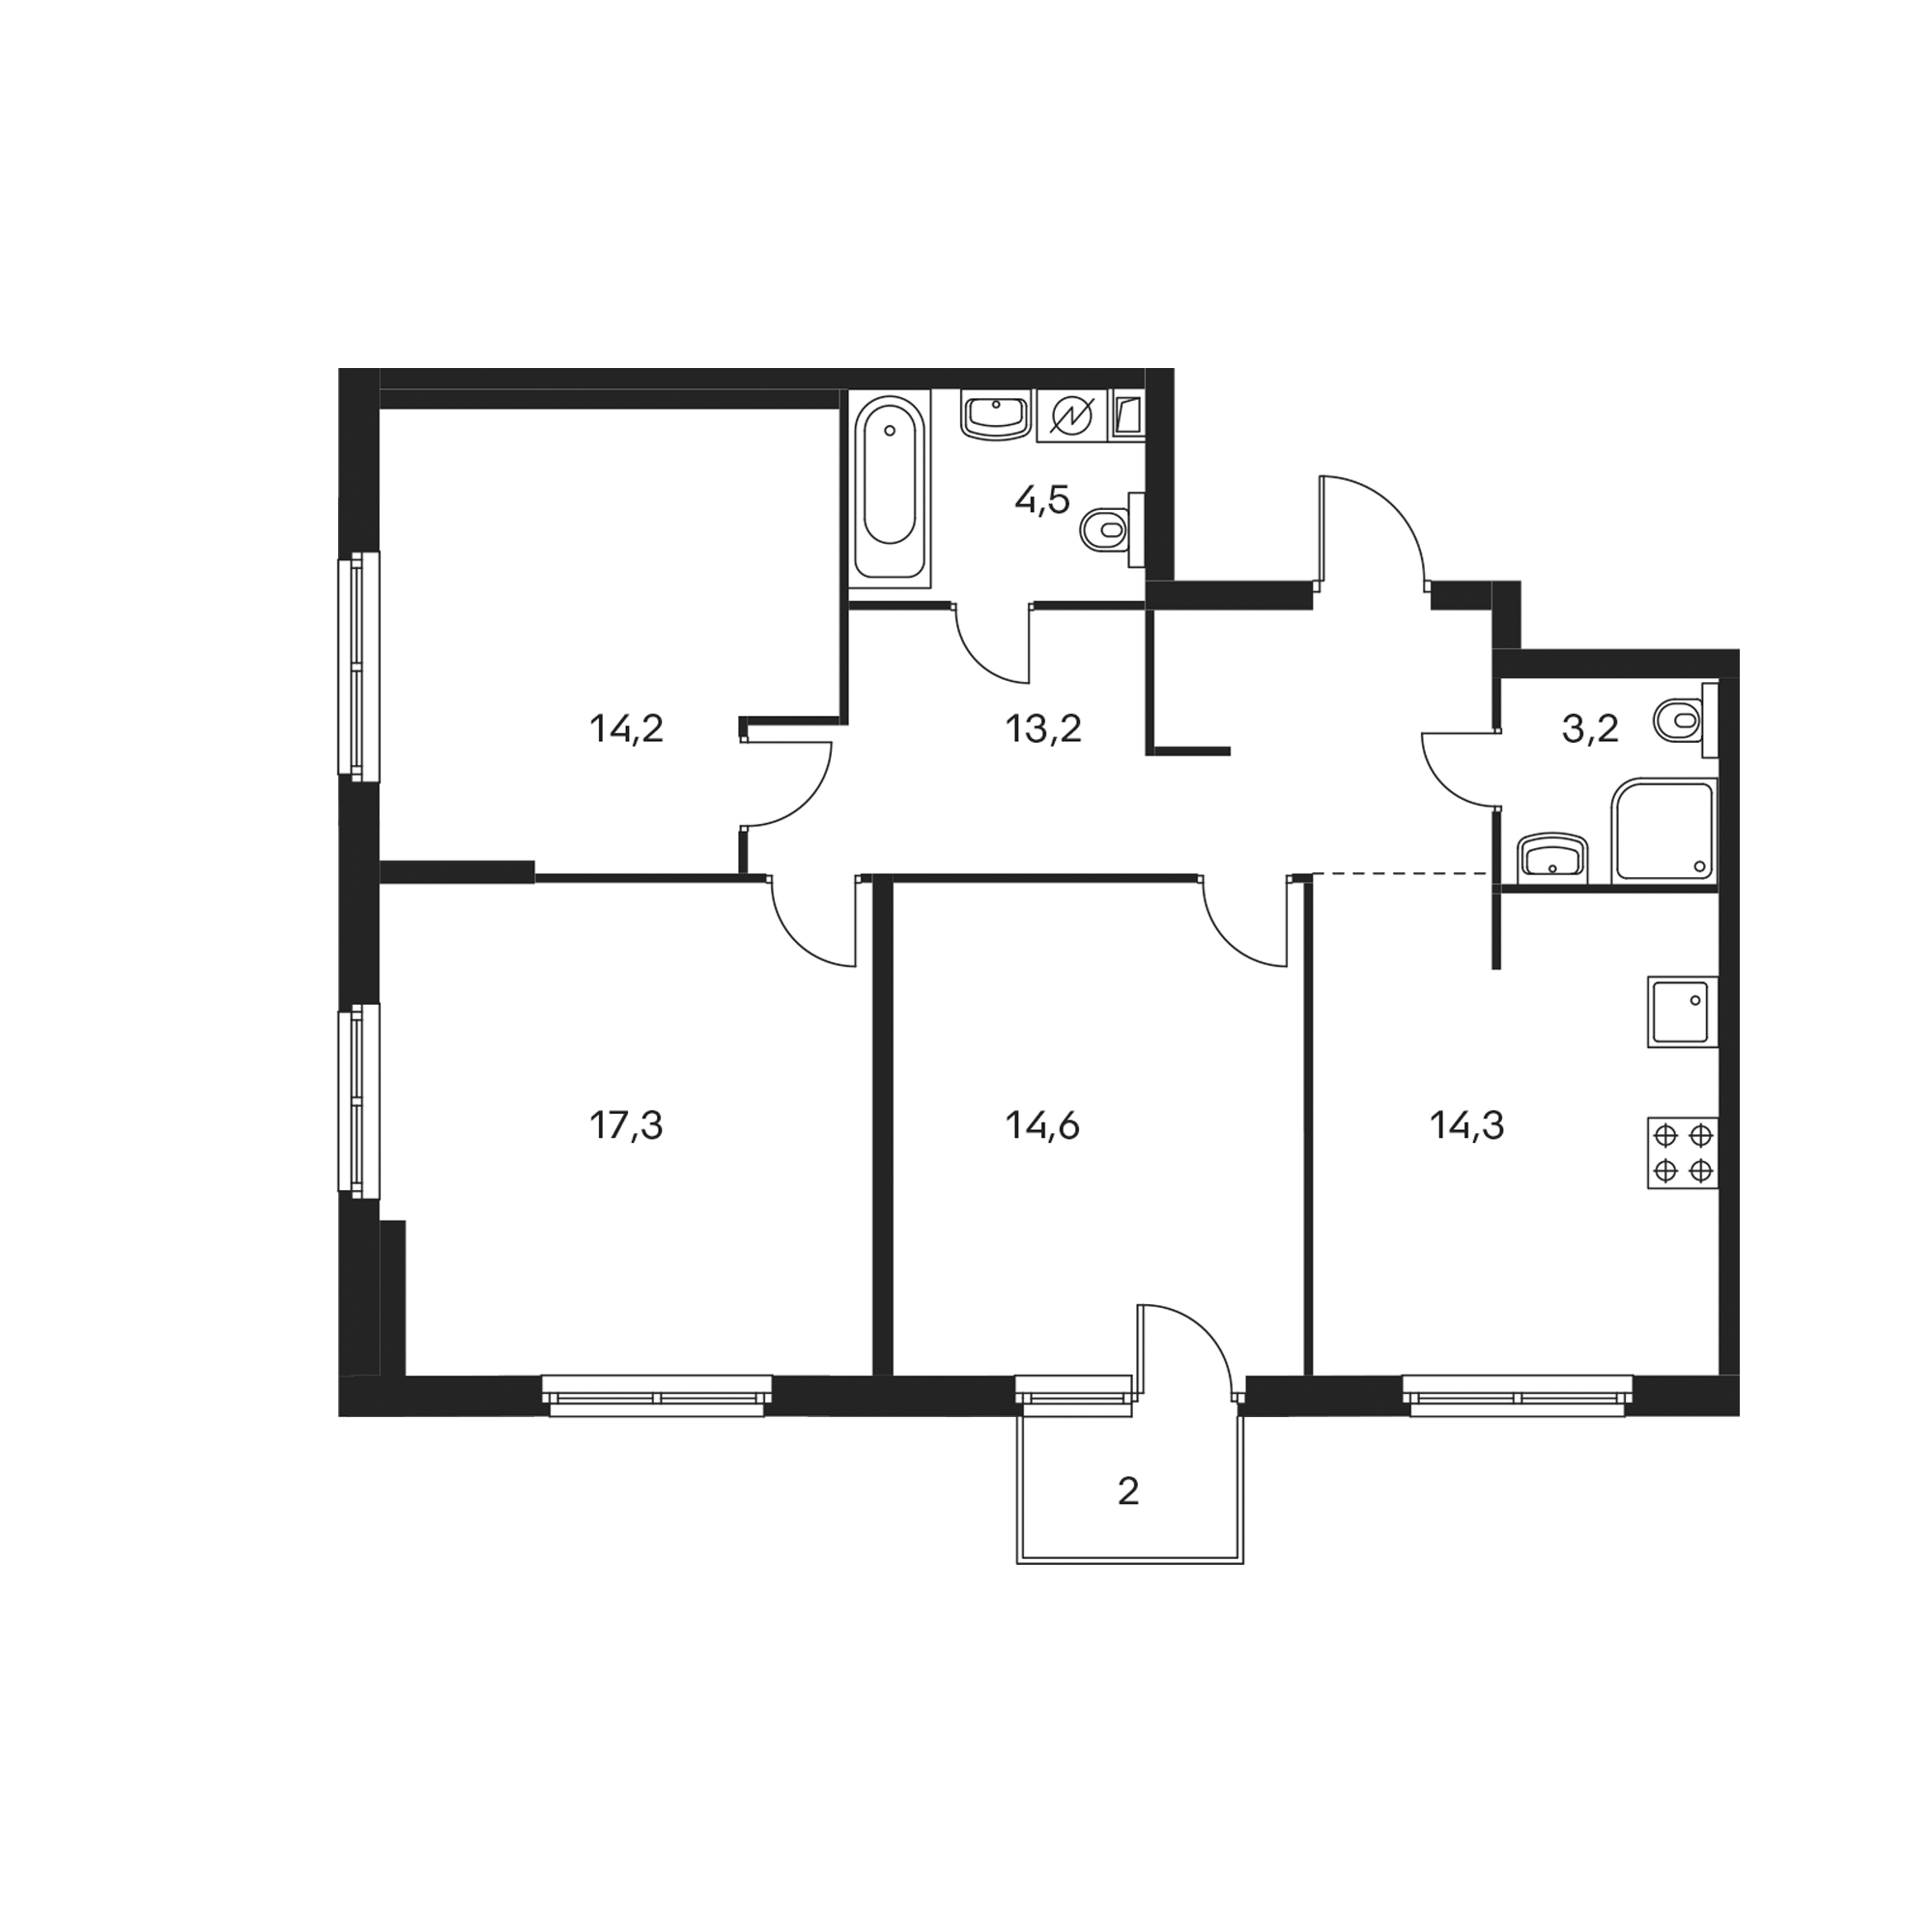 3KM6_8.4-B1